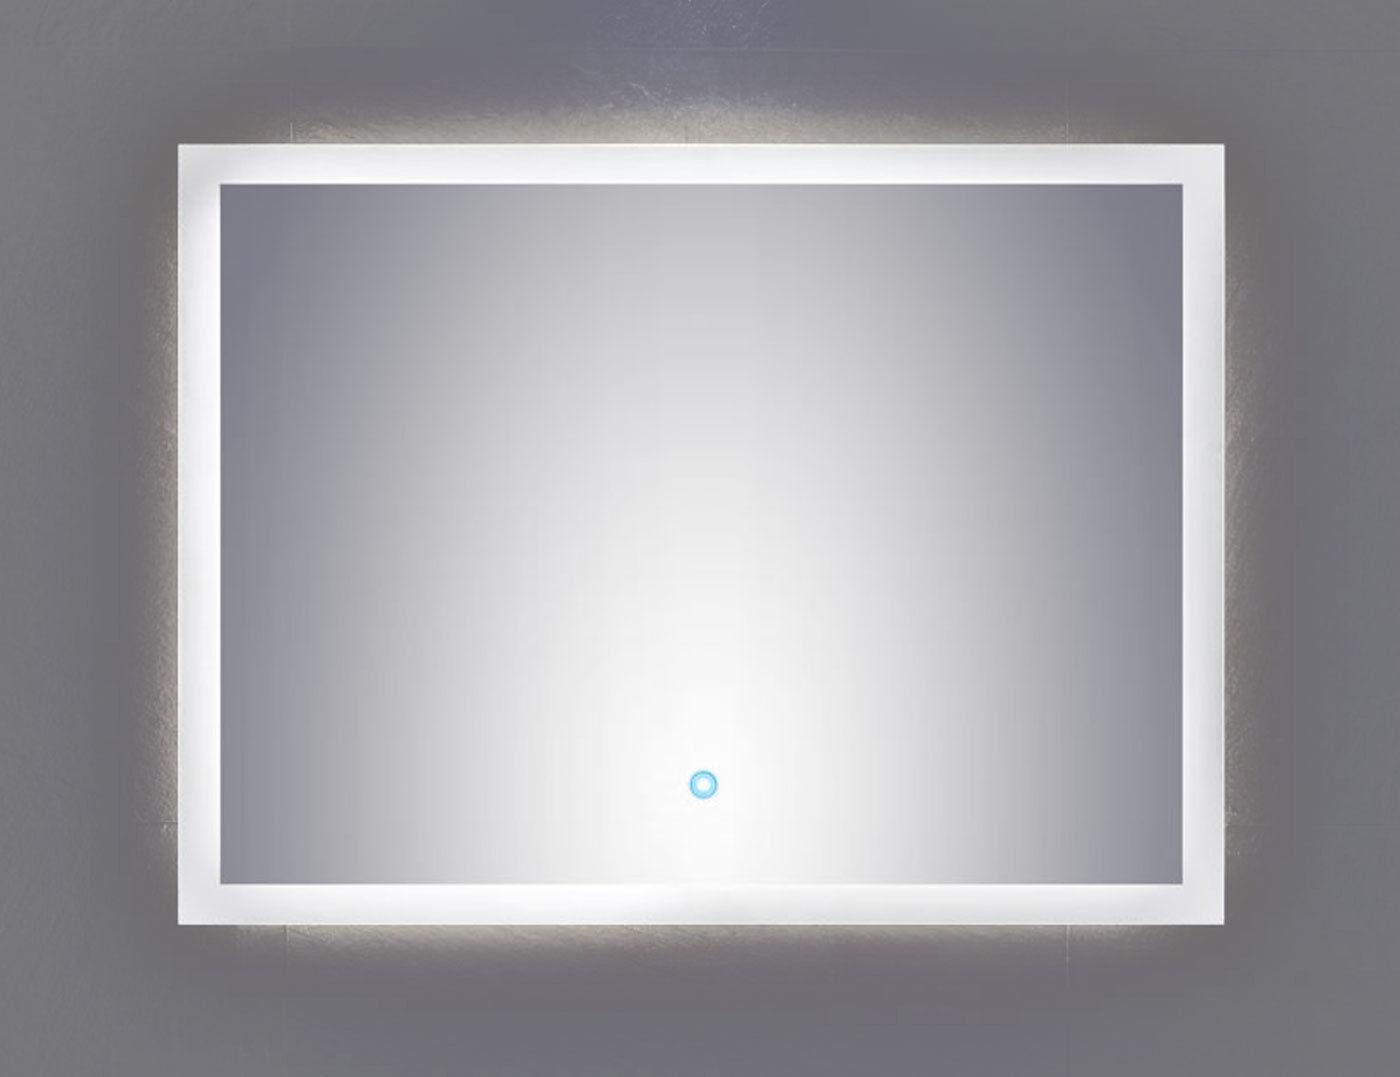 Led Badezimmer, led badezimmer wand spiegel emotion 80 x 60 cm touch bedienung 34 w, Design ideen